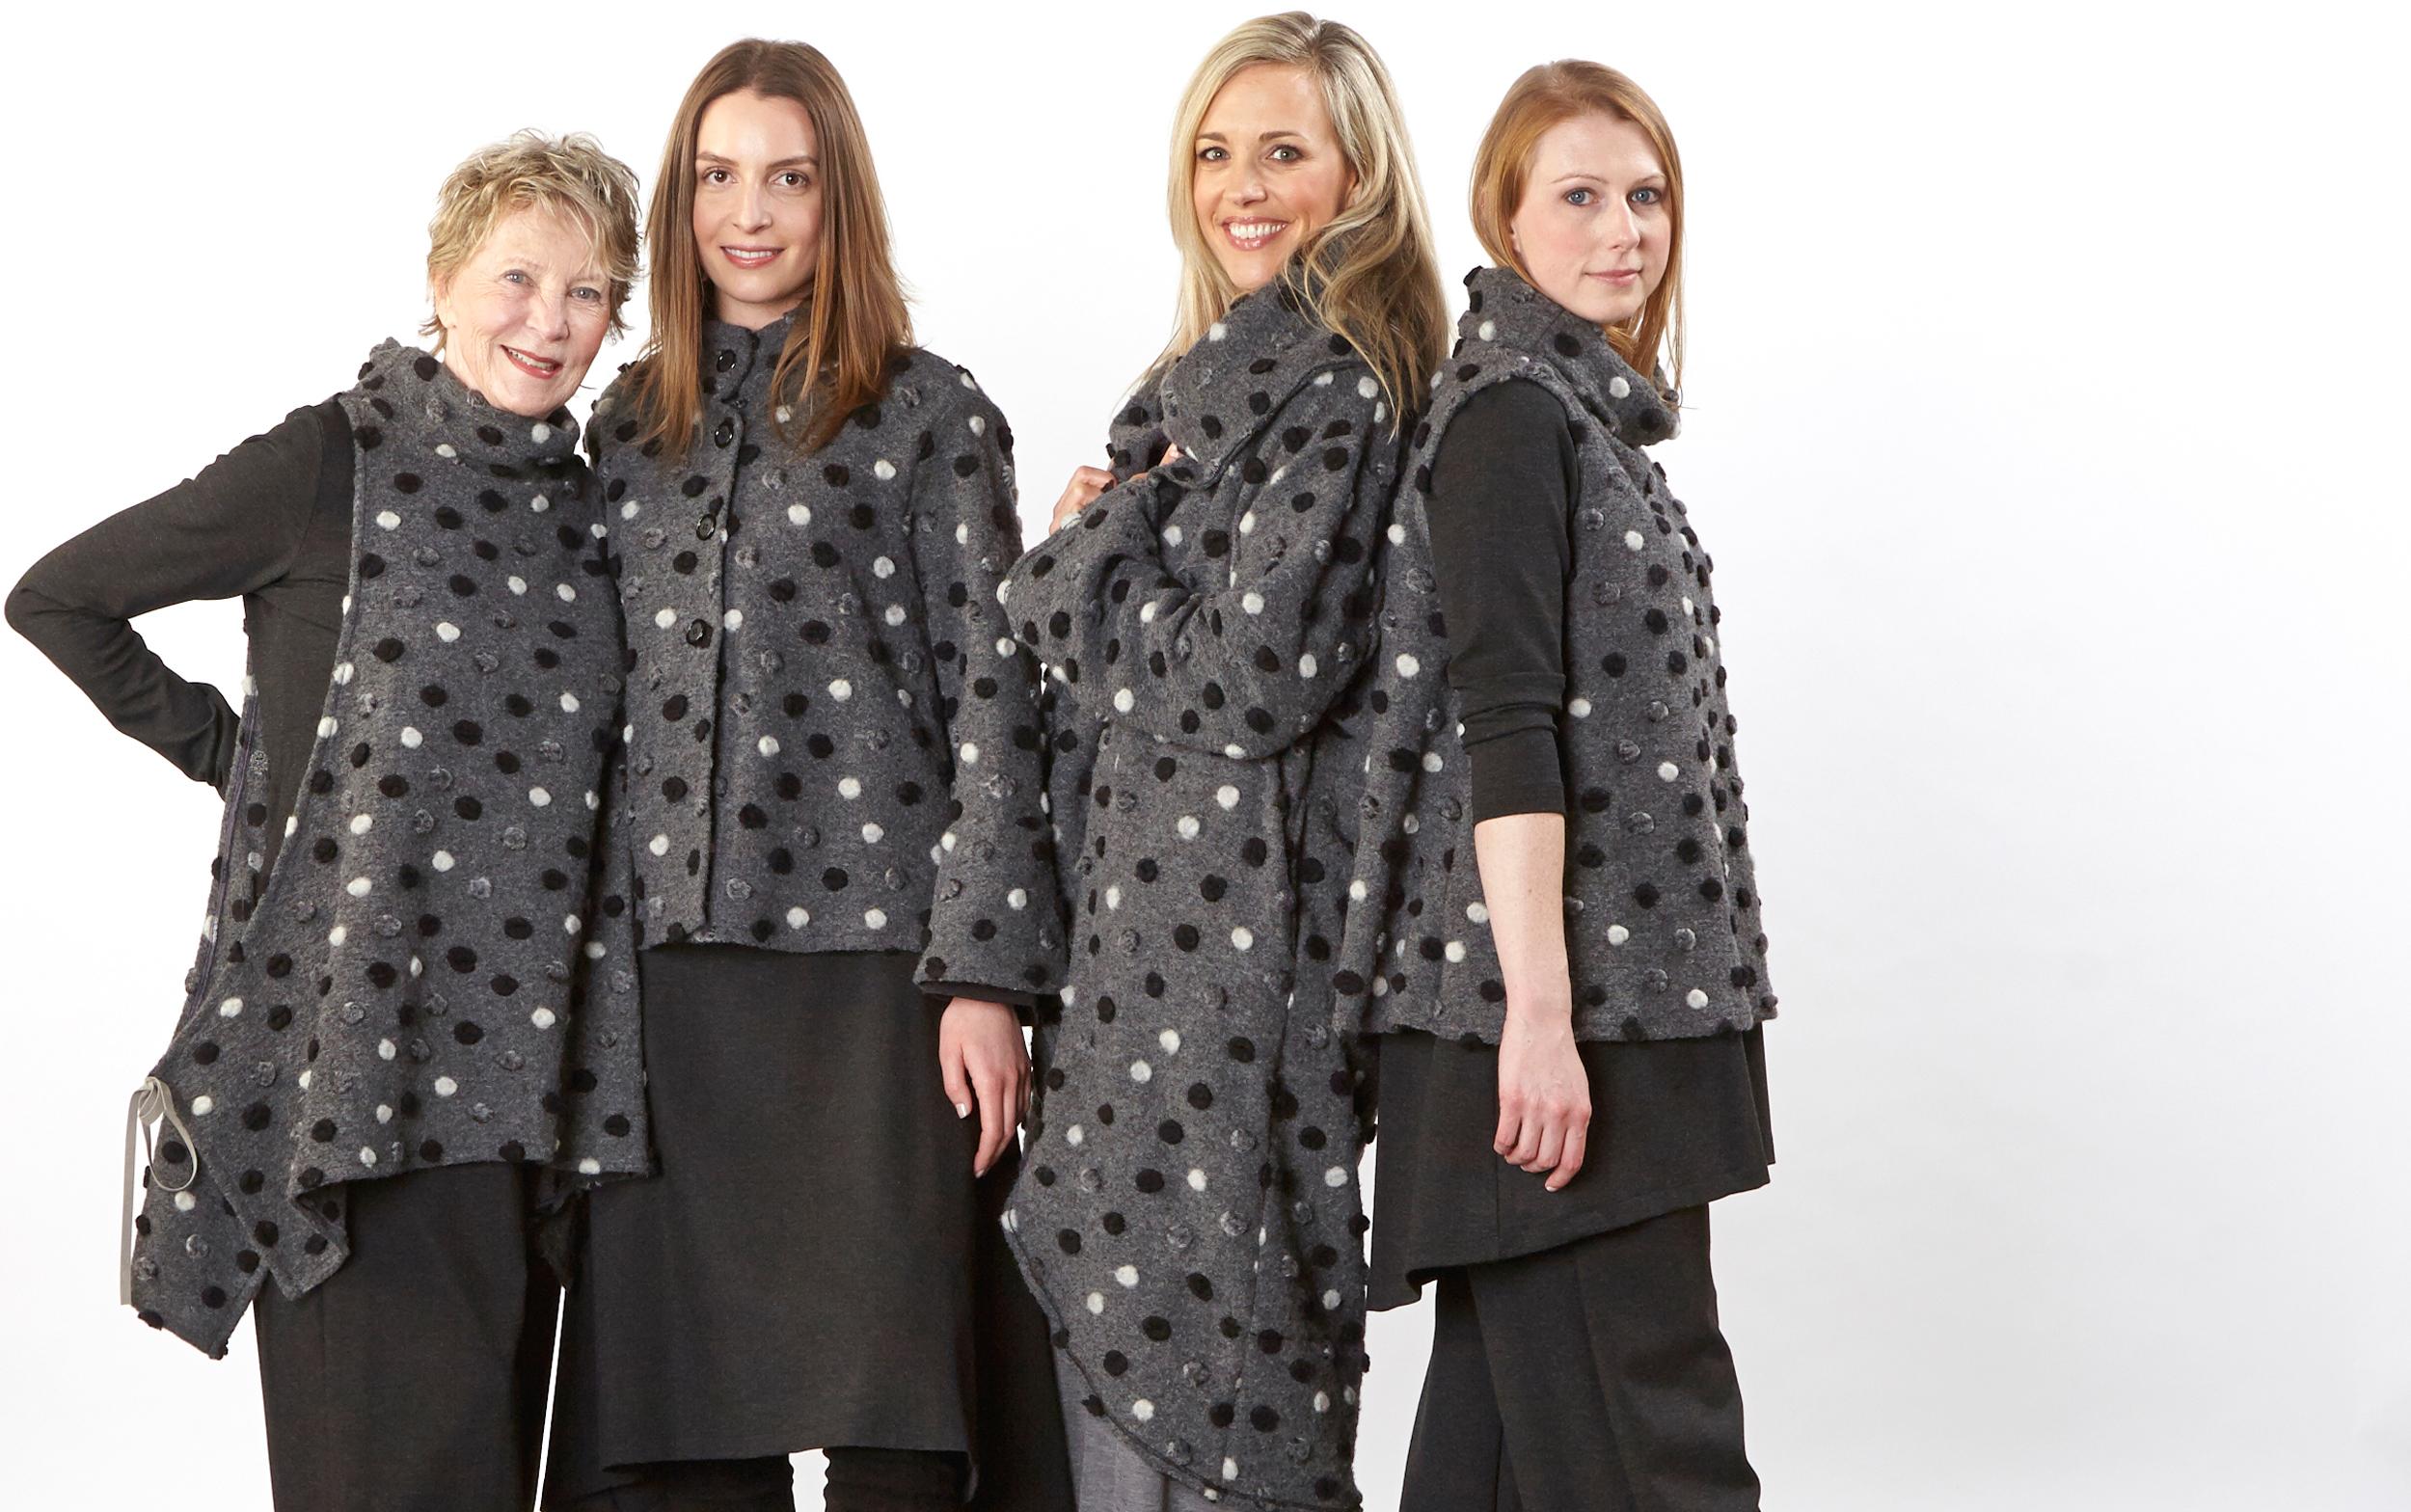 Dorian Vest, Sabira Jacket, Wrap Coat, Etta Vest in Grey Italian Wool Dots, Liam Tunic, Palazzo Pant, Sean Skirt, Oliver Pant in Grey Italian Melange